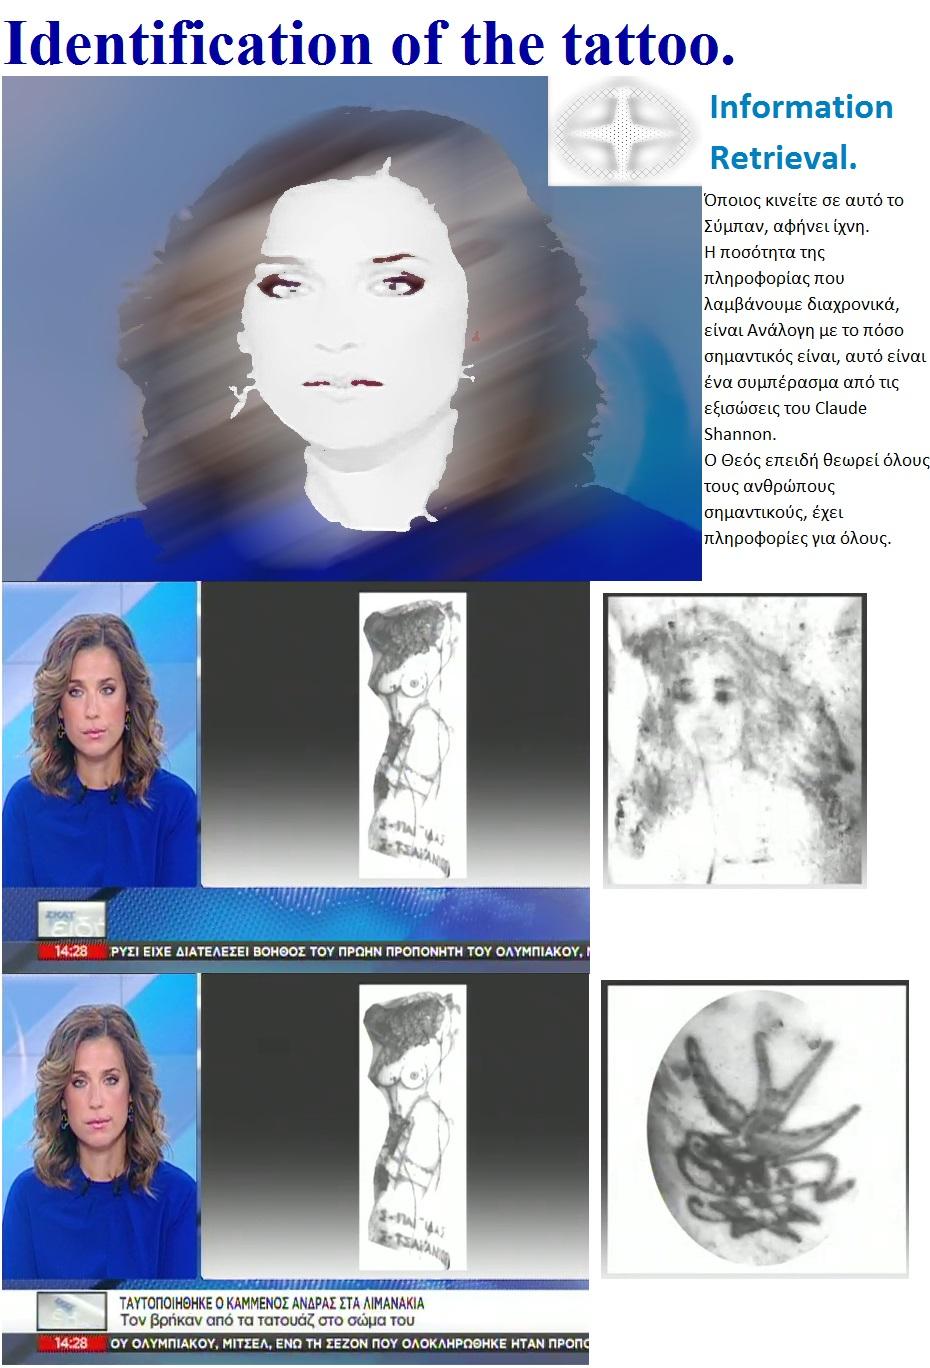 ELLADA CRIME IDENTITY TAYTOPOIHSH TATOO WOMAN 01 130716